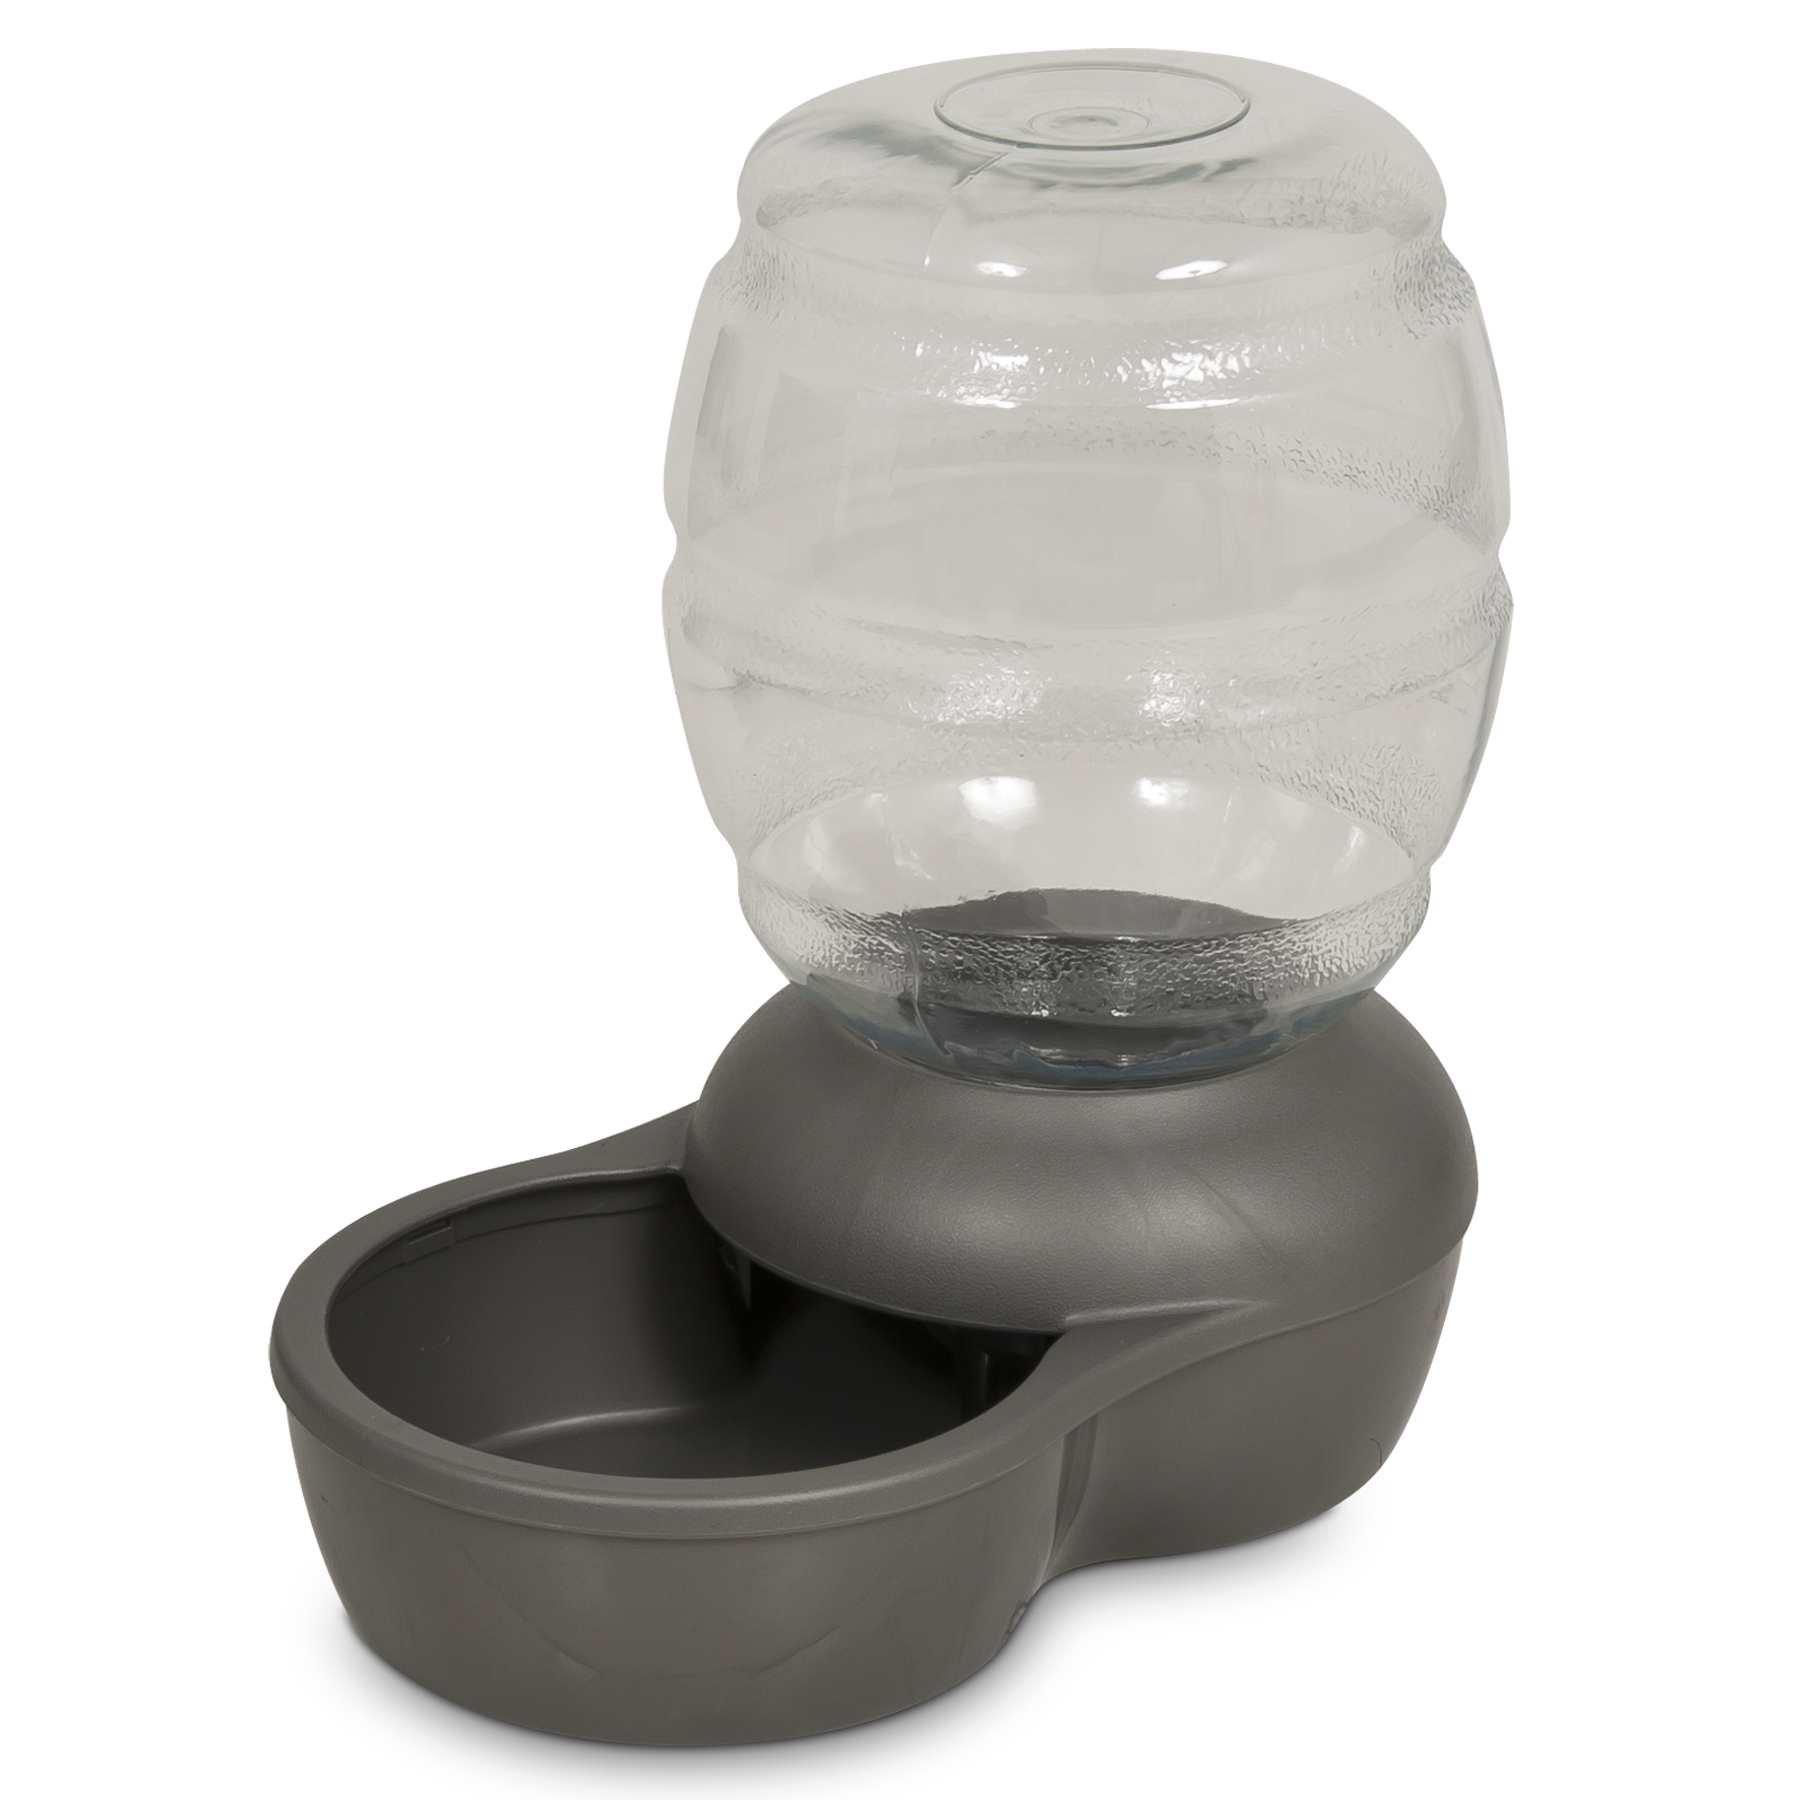 Petmate Replendish Waterer with Microban for Pets, Mason Silver, Medium